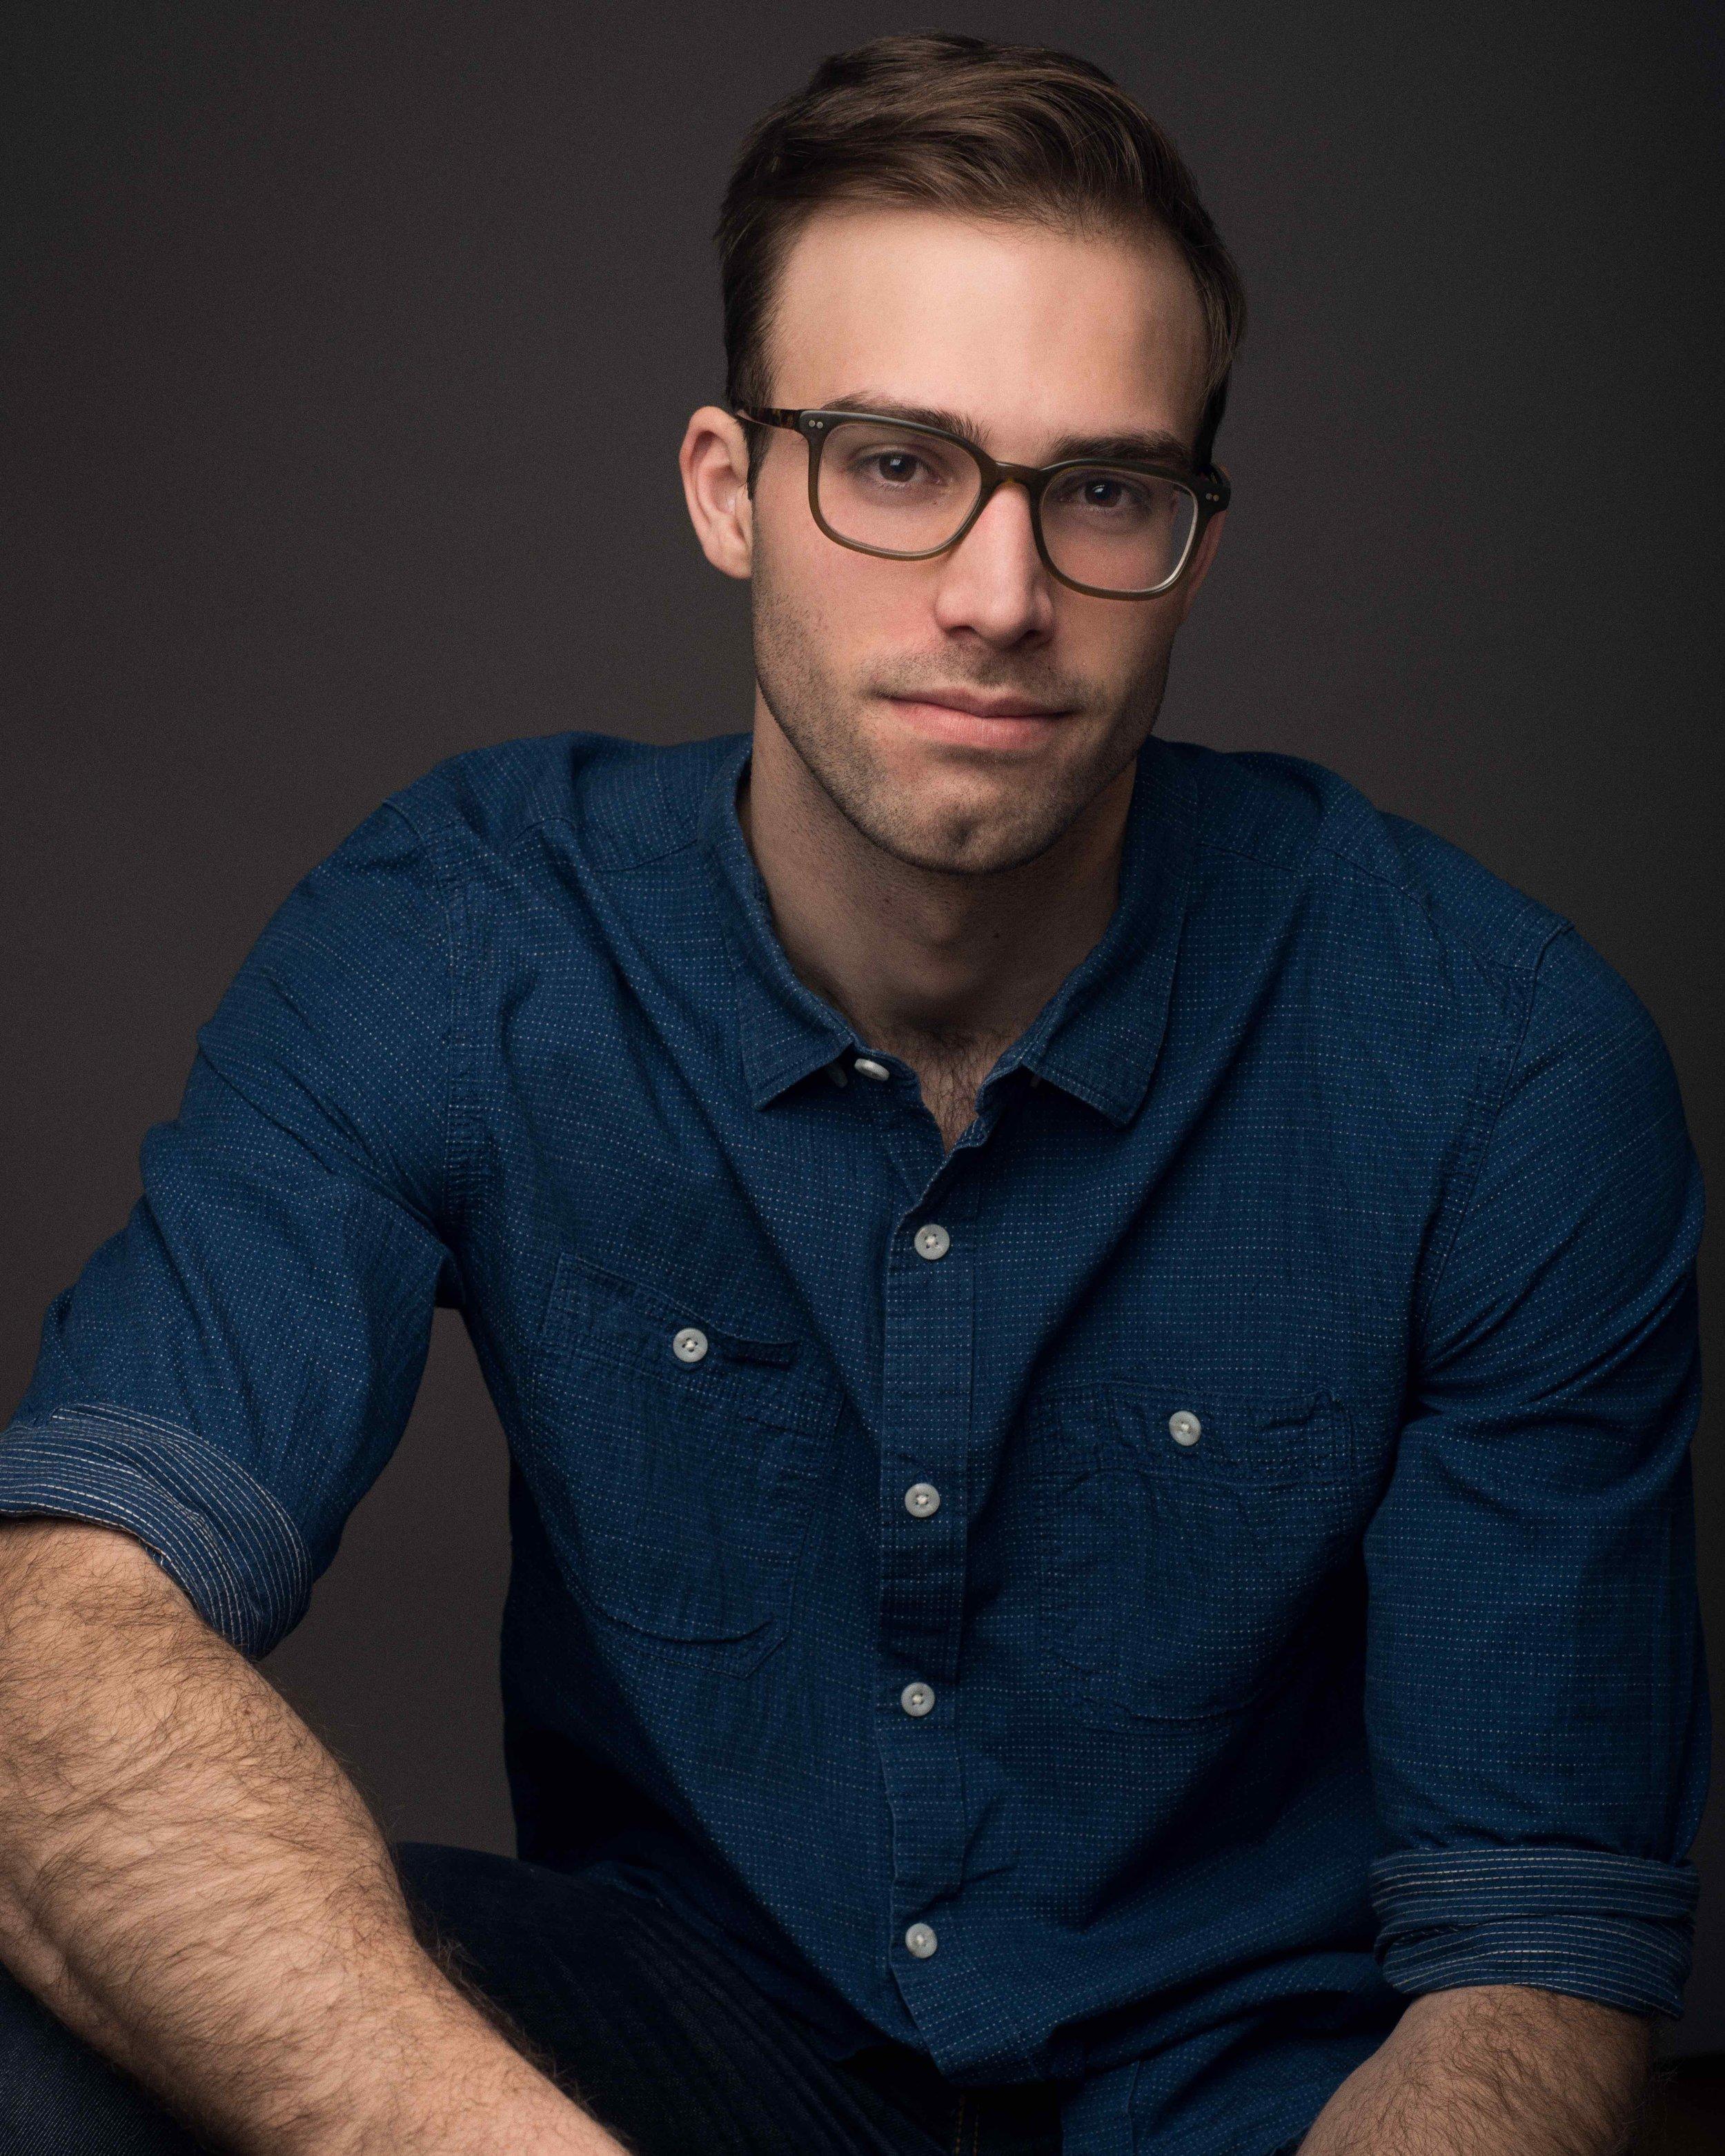 Dylan Palladino Glasses Legit.jpg